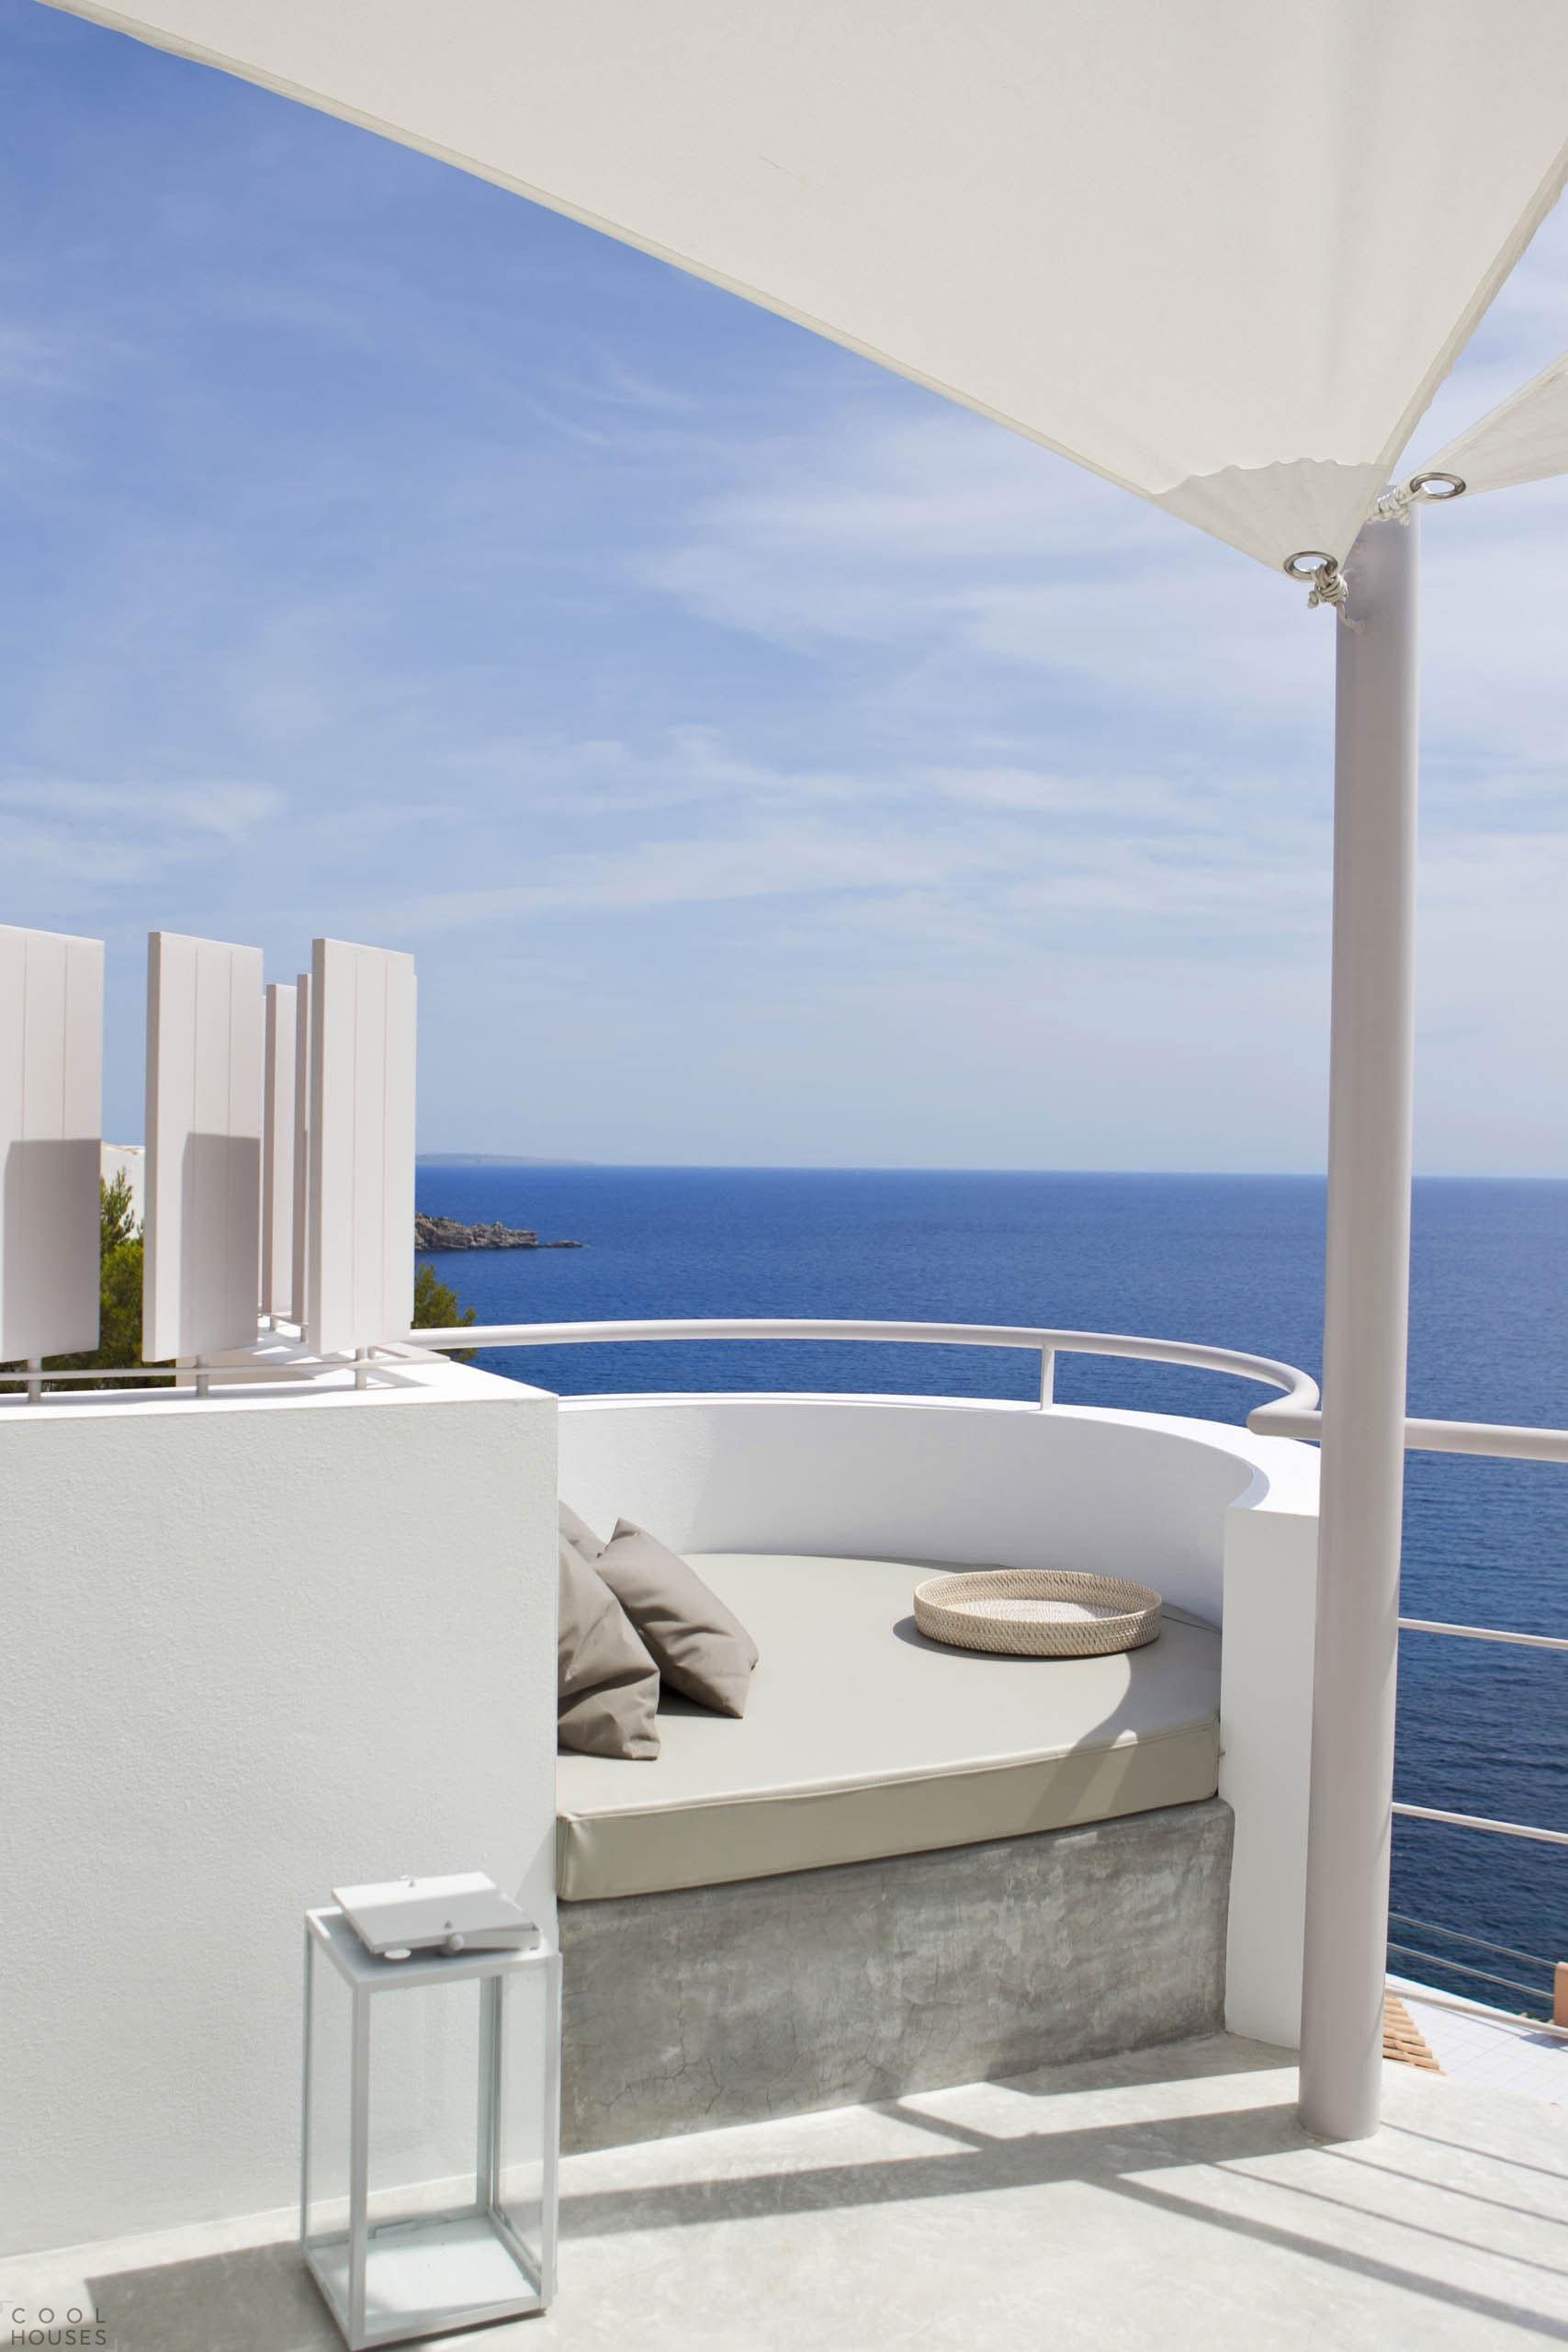 Уютная вилла на Балеарских островах в Испании